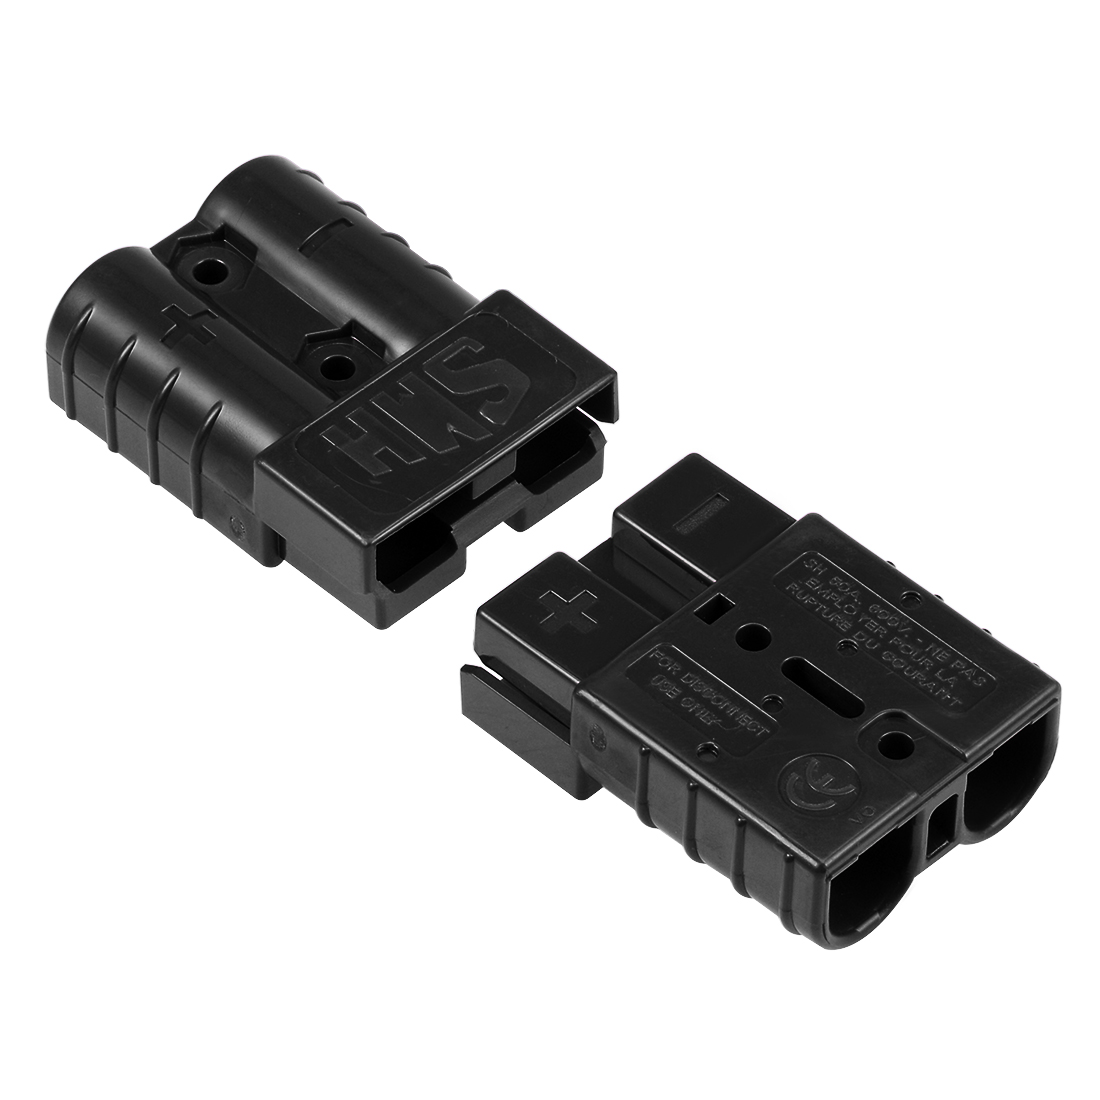 6 Gauge Battery Quick Connect Disconnect 50A Wire Connector, Black, 4pcs